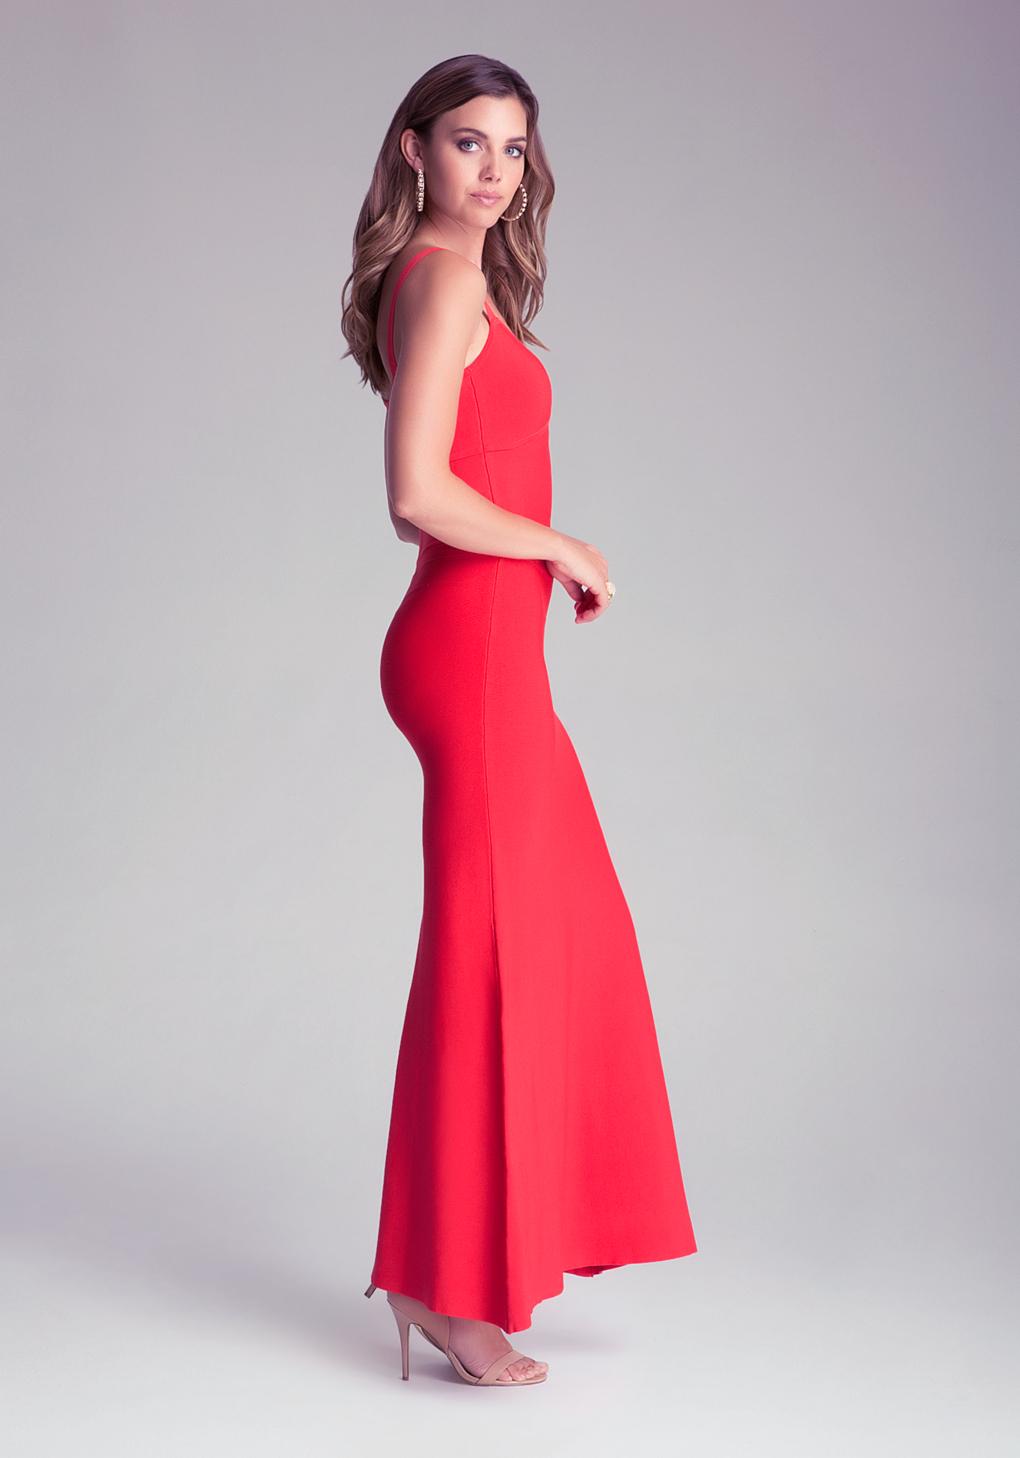 Lyst - Bebe Bodycon Maxi Dress in Red 32de25804